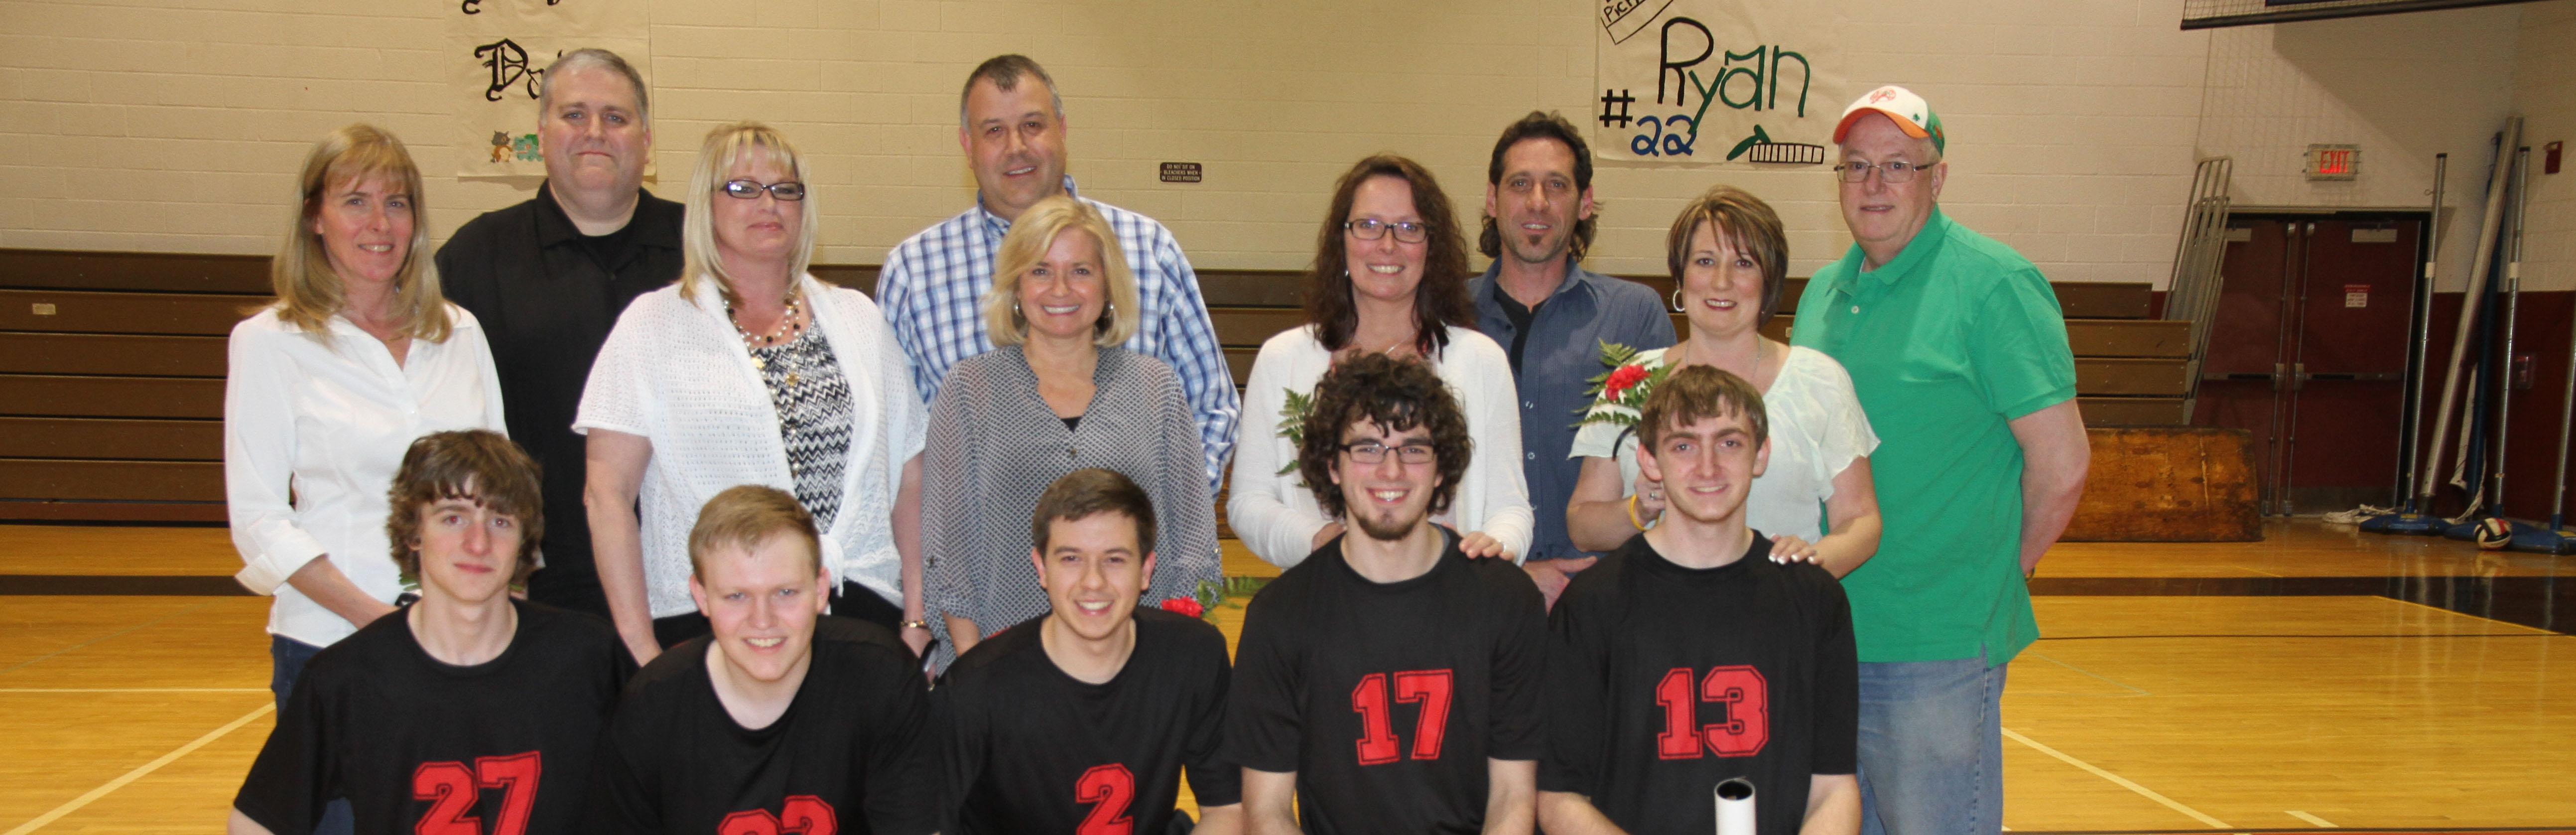 LT Boys Volleyball Parents